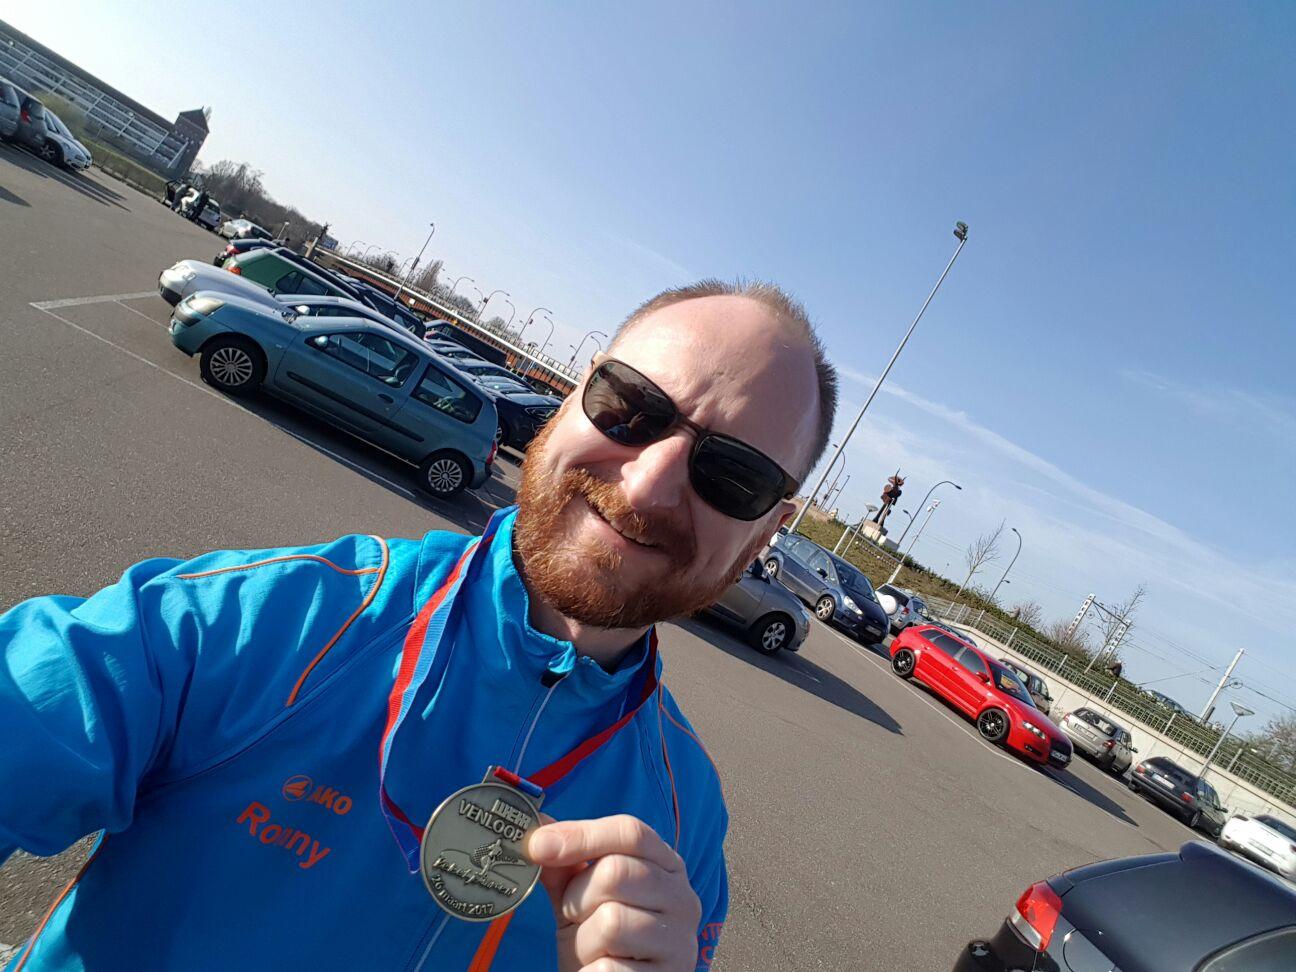 Ronny beim Wehr Venloop Halbmarathon in Holland